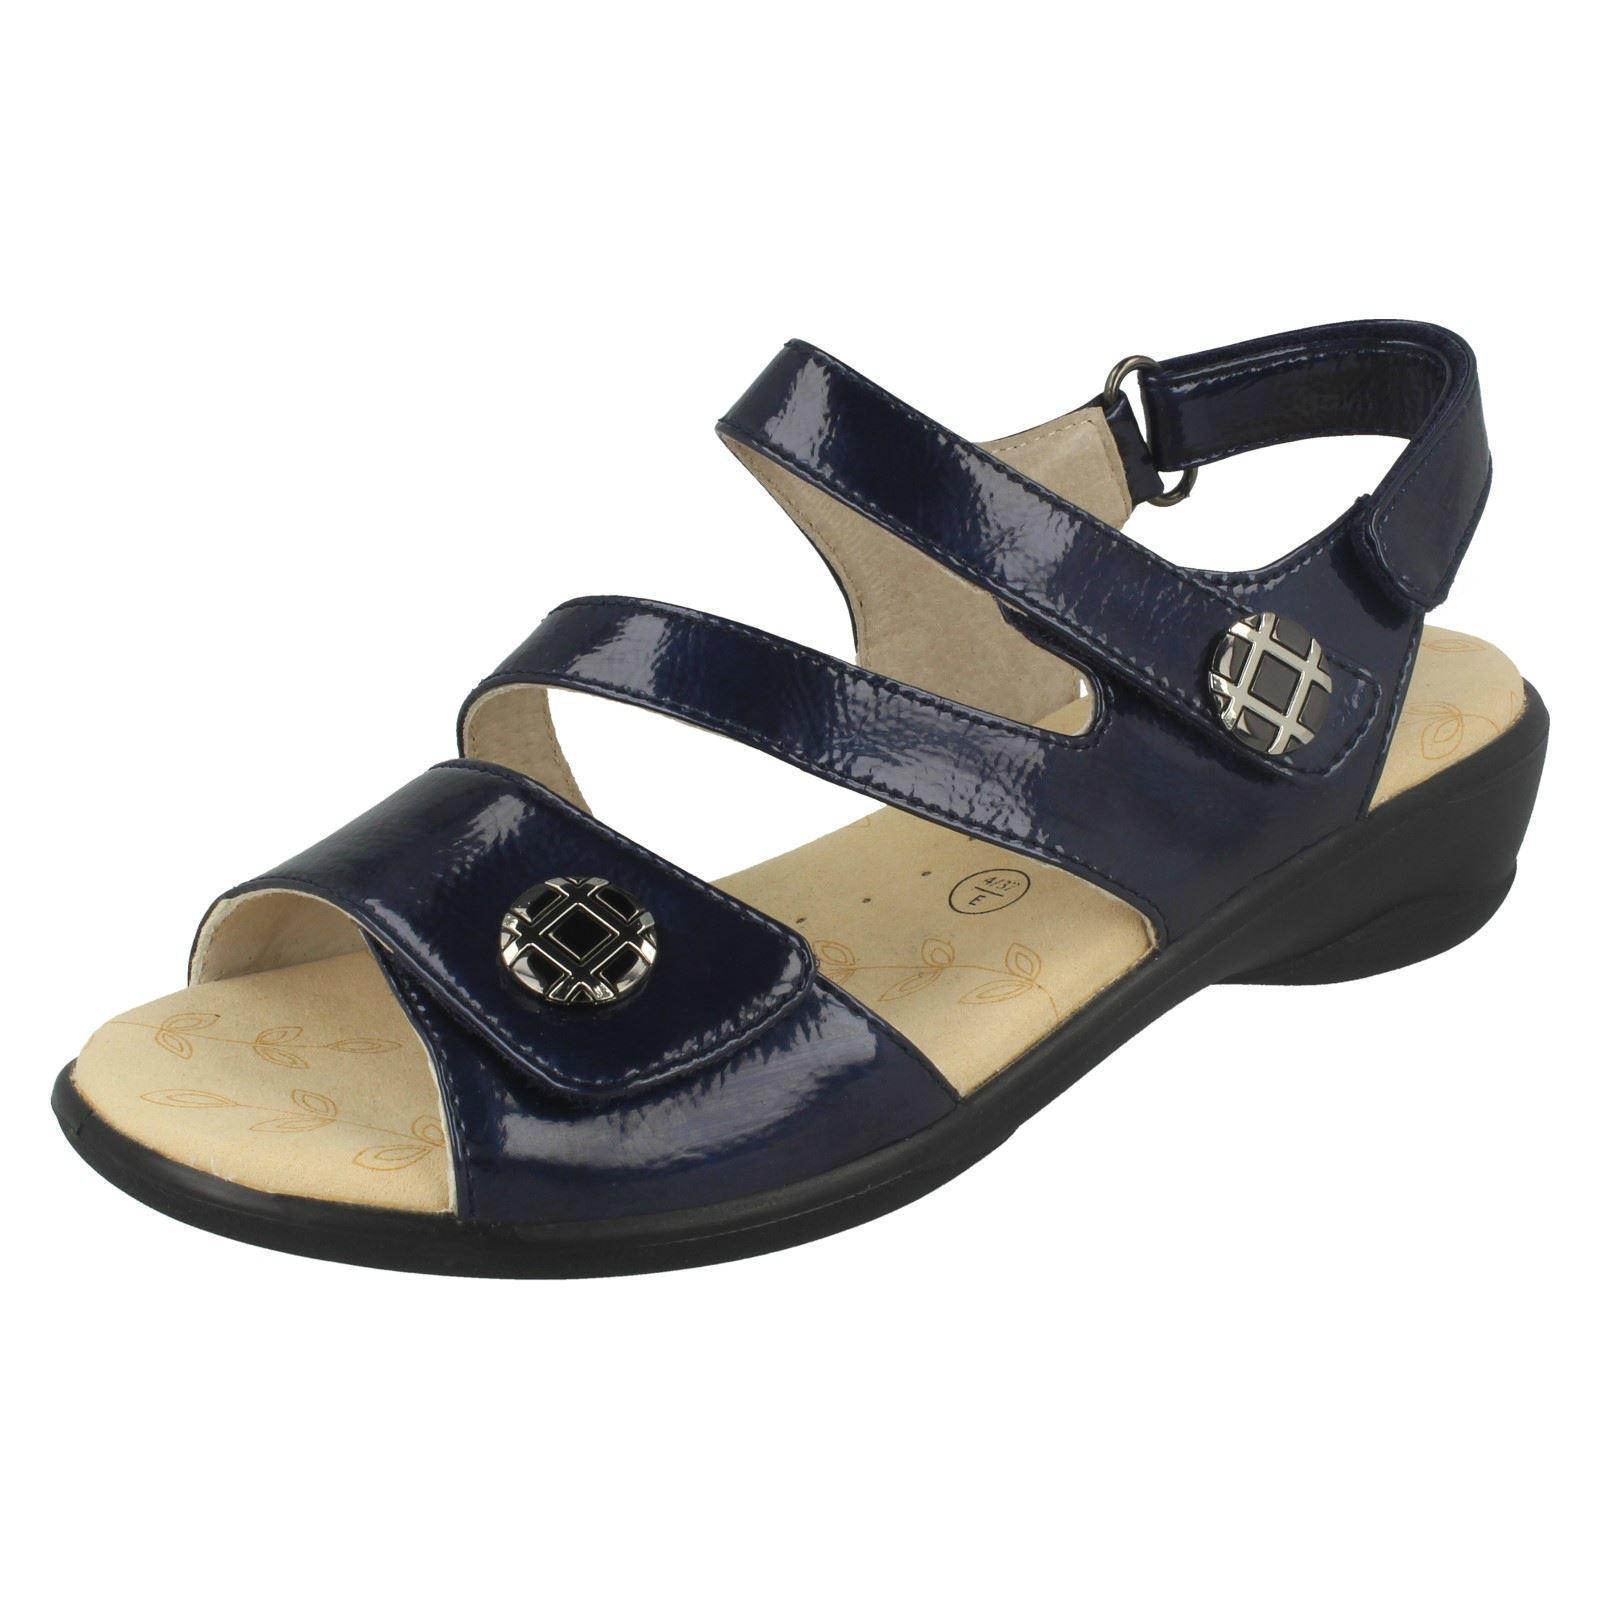 Mujer Viena Corte Ancho Azul Marino Charol Sintético Sandalias de Padders